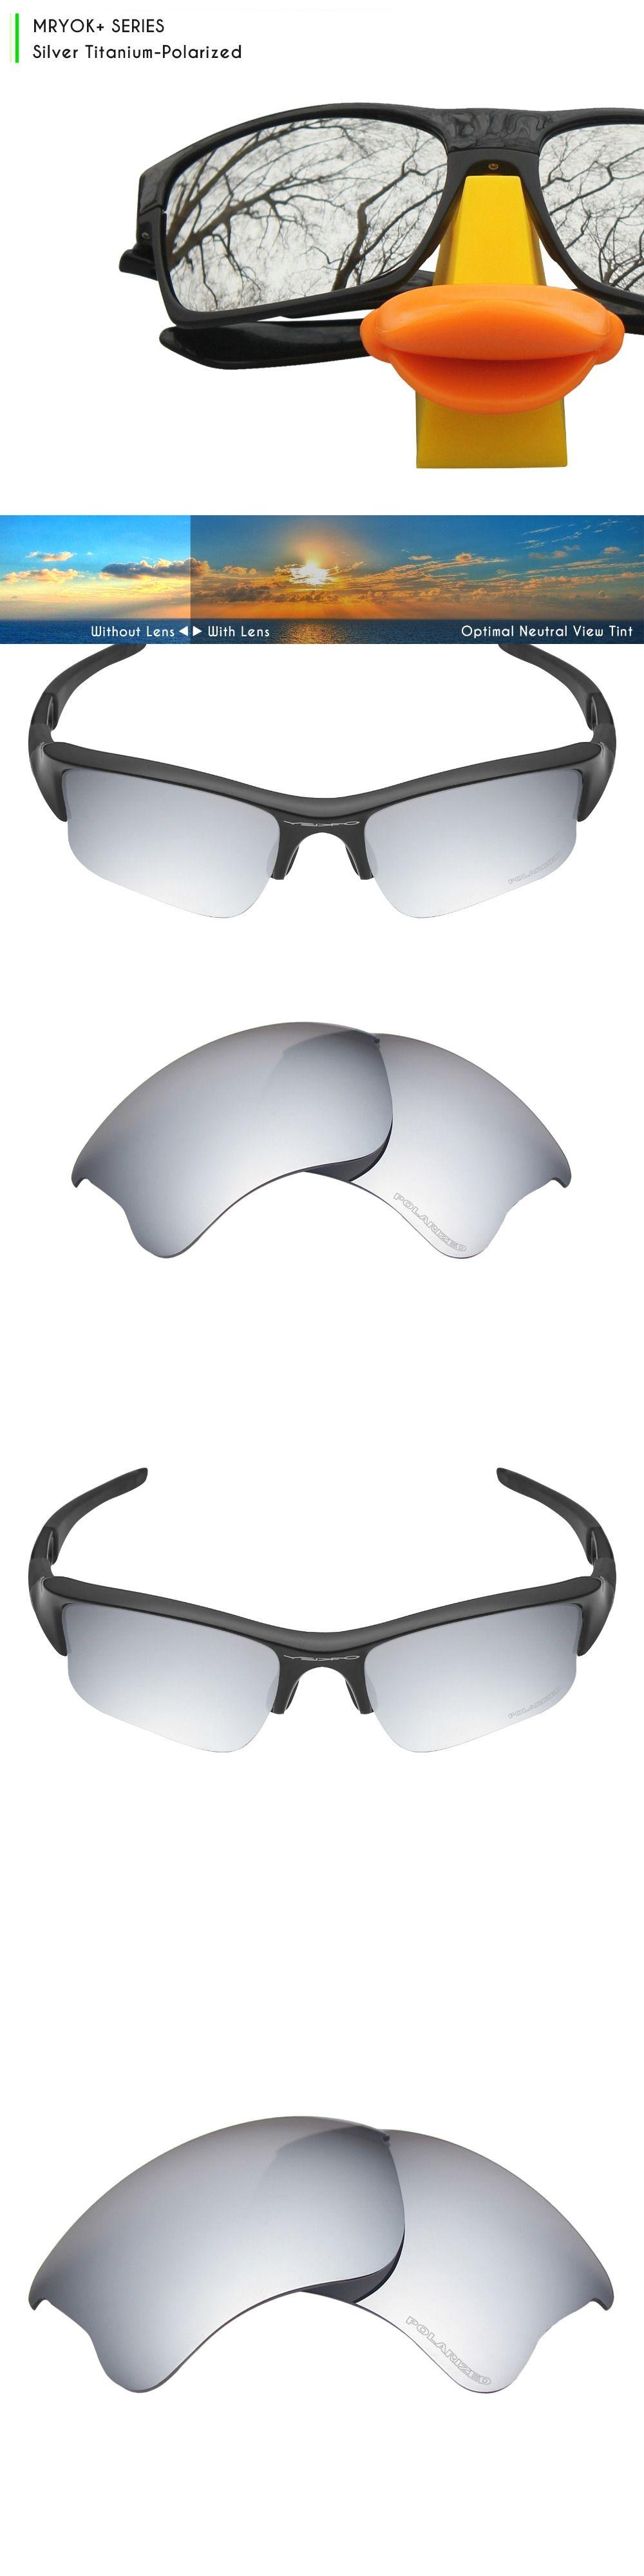 b9686ed87ffd9 Mryok+ POLARIZED Resist SeaWater Replacement Lenses for Oakley Flak Jacket  XLJ Sunglasses Silver Titanium